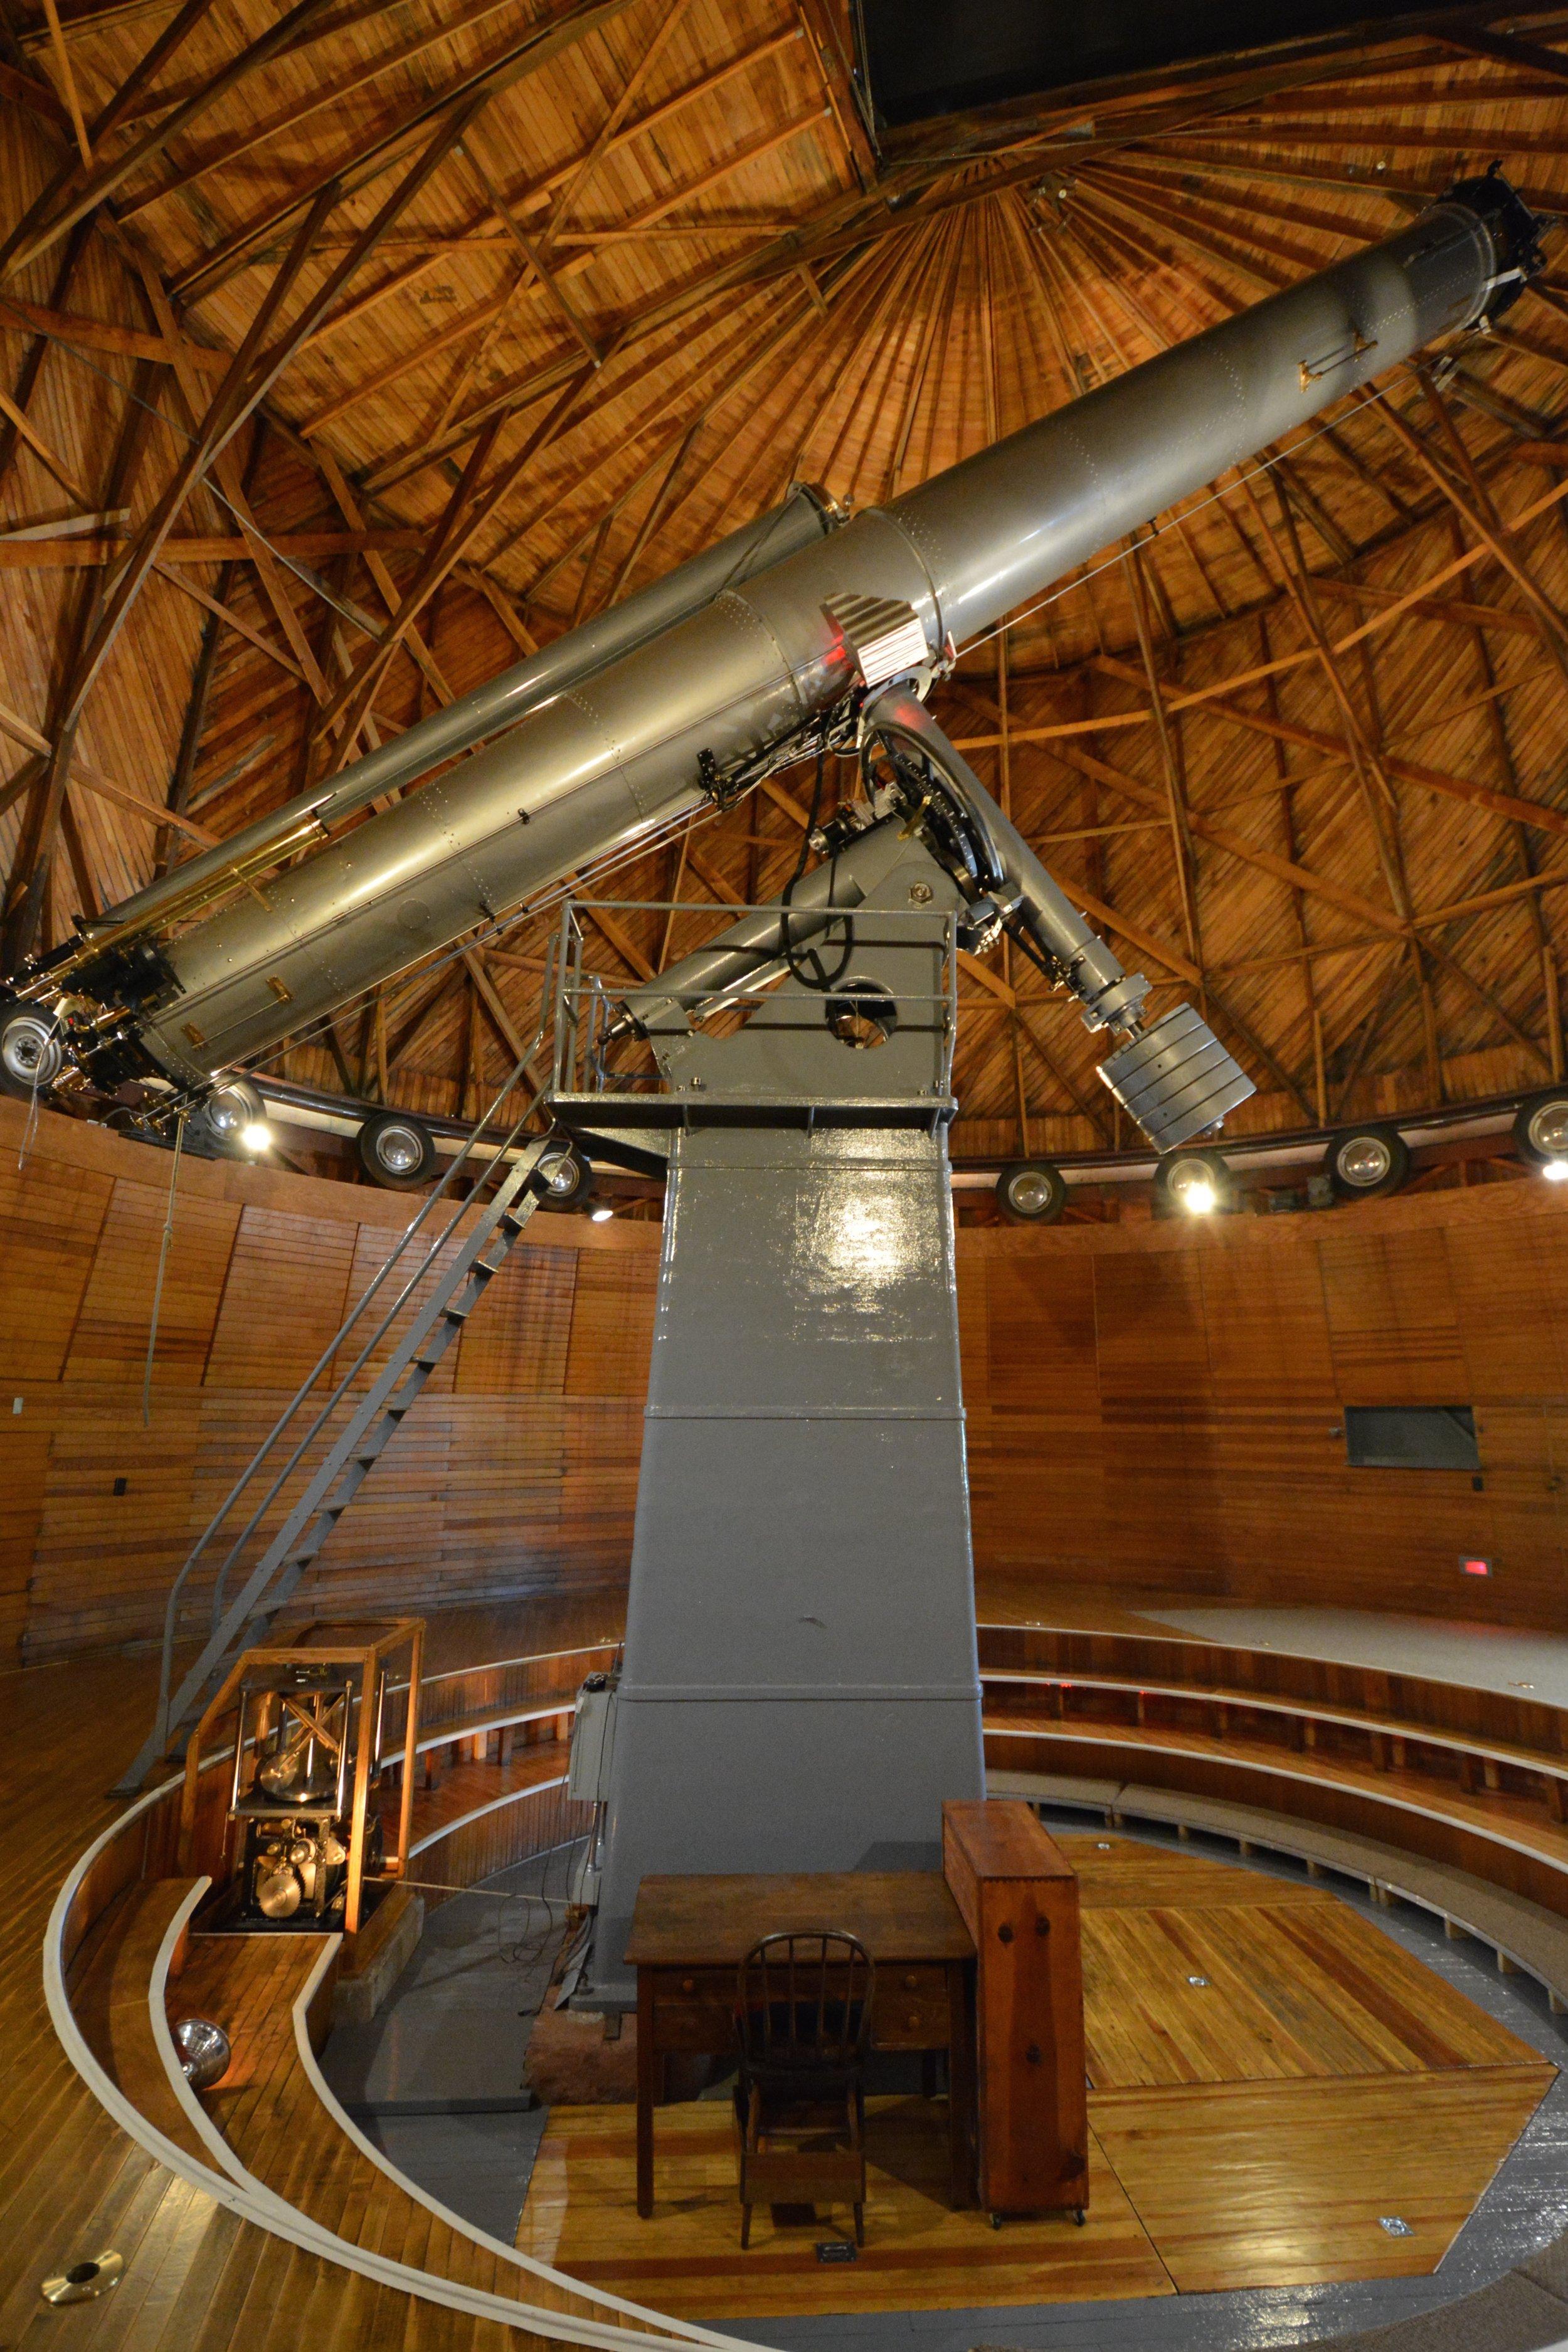 The Clark Telescope. Image Credit: Conant/Blazek/Lowell Observatory